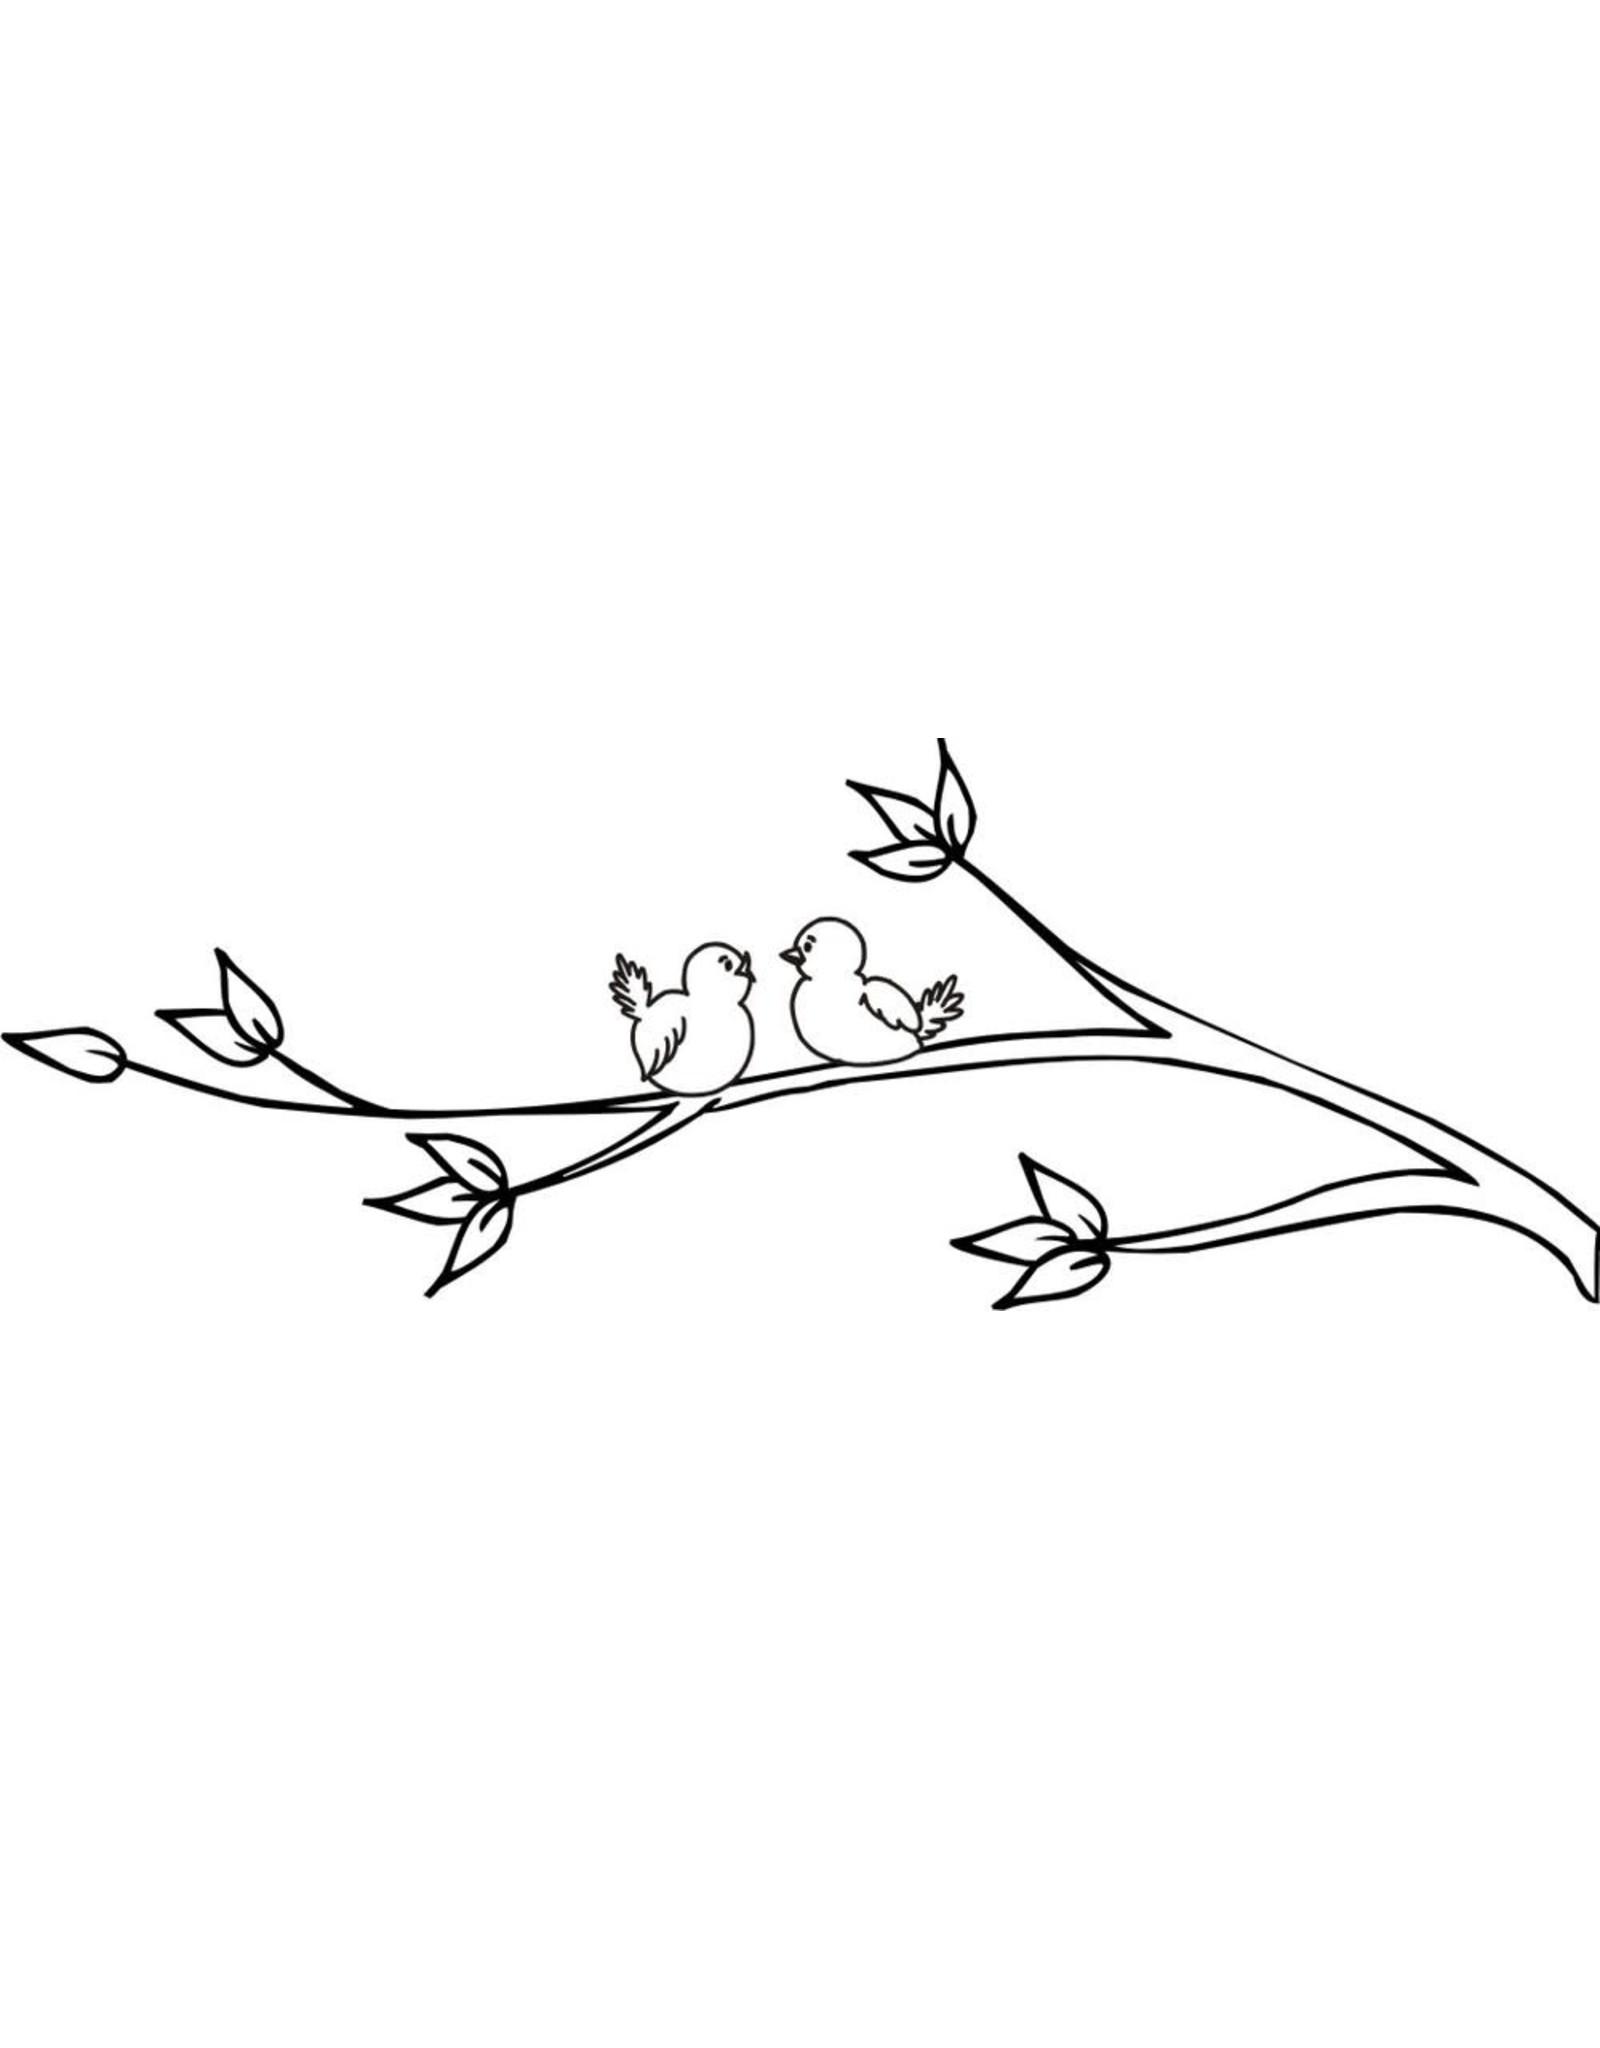 DRS Designs Lovebirds Branch Cling Stamp